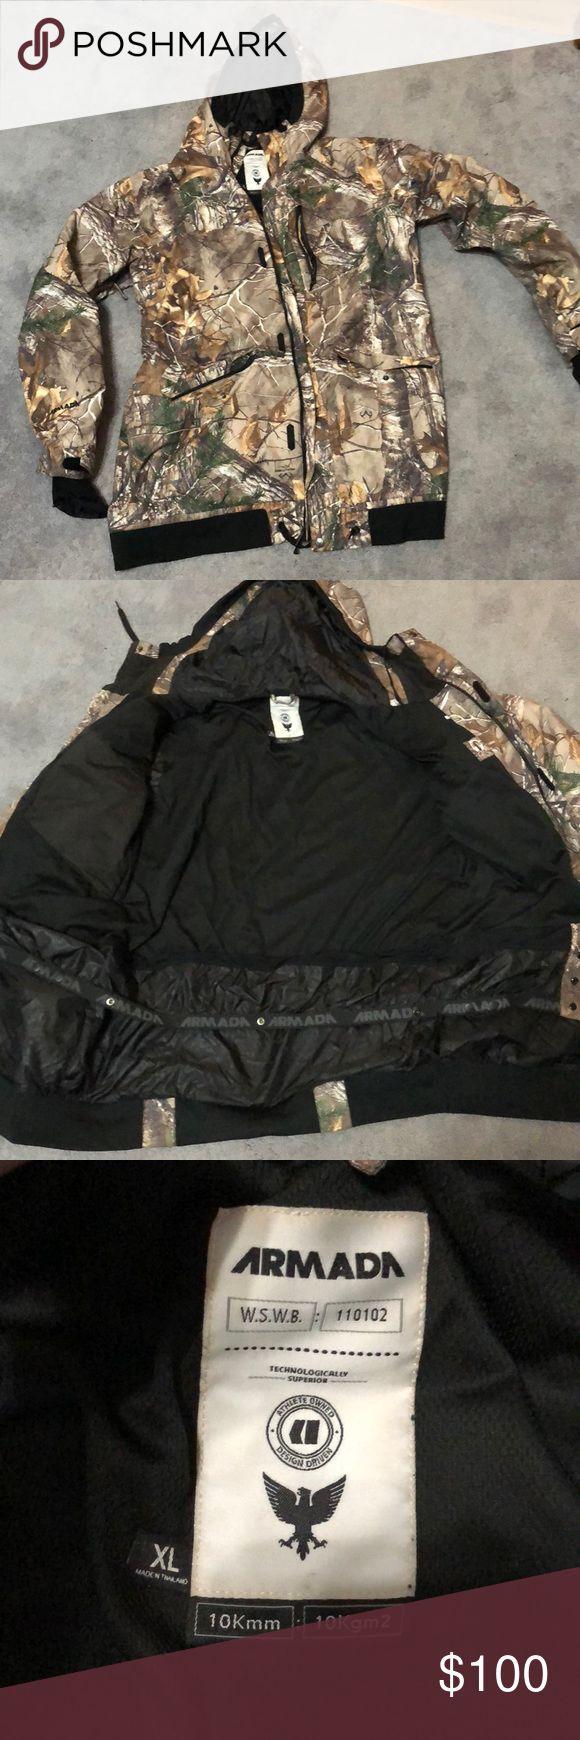 snowboarding jacket armada real tree camo snowboarding jacket, XL.. good condition. armada Jackets & Coats Ski & Snowboard